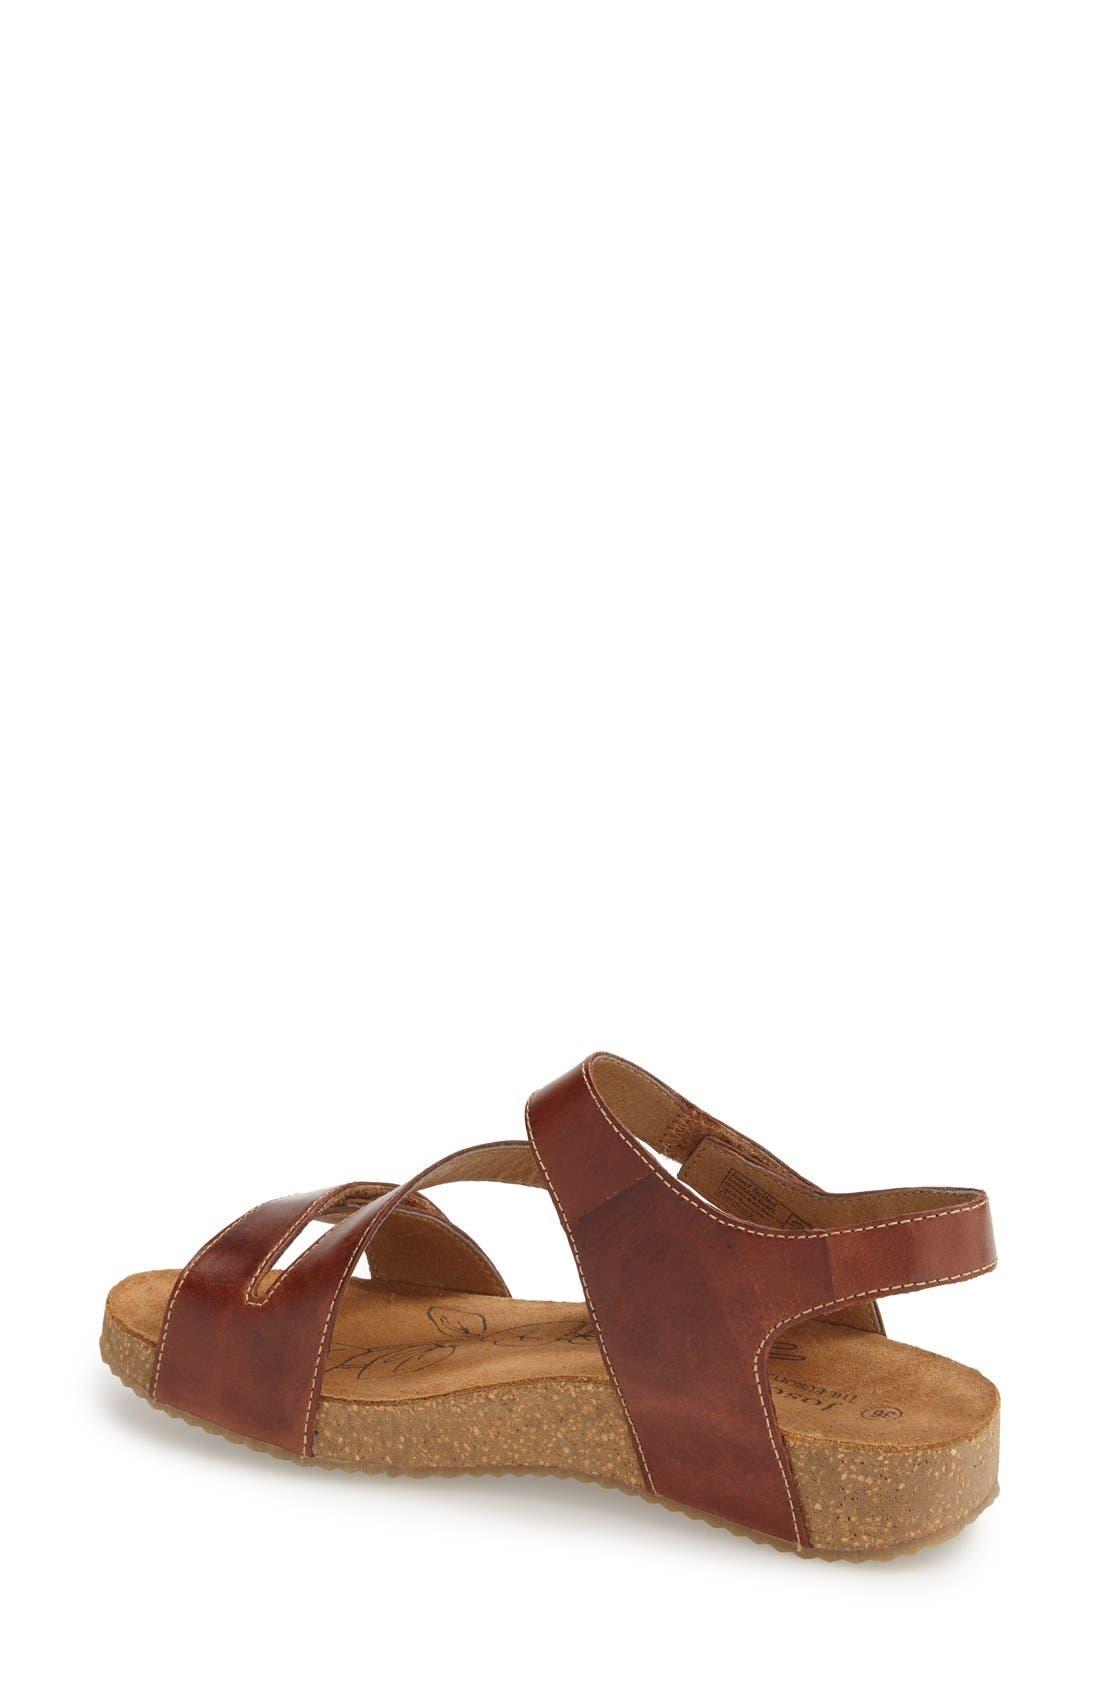 Alternate Image 2  - Josef Seibel 'Tonga' Leather Sandal (Women)